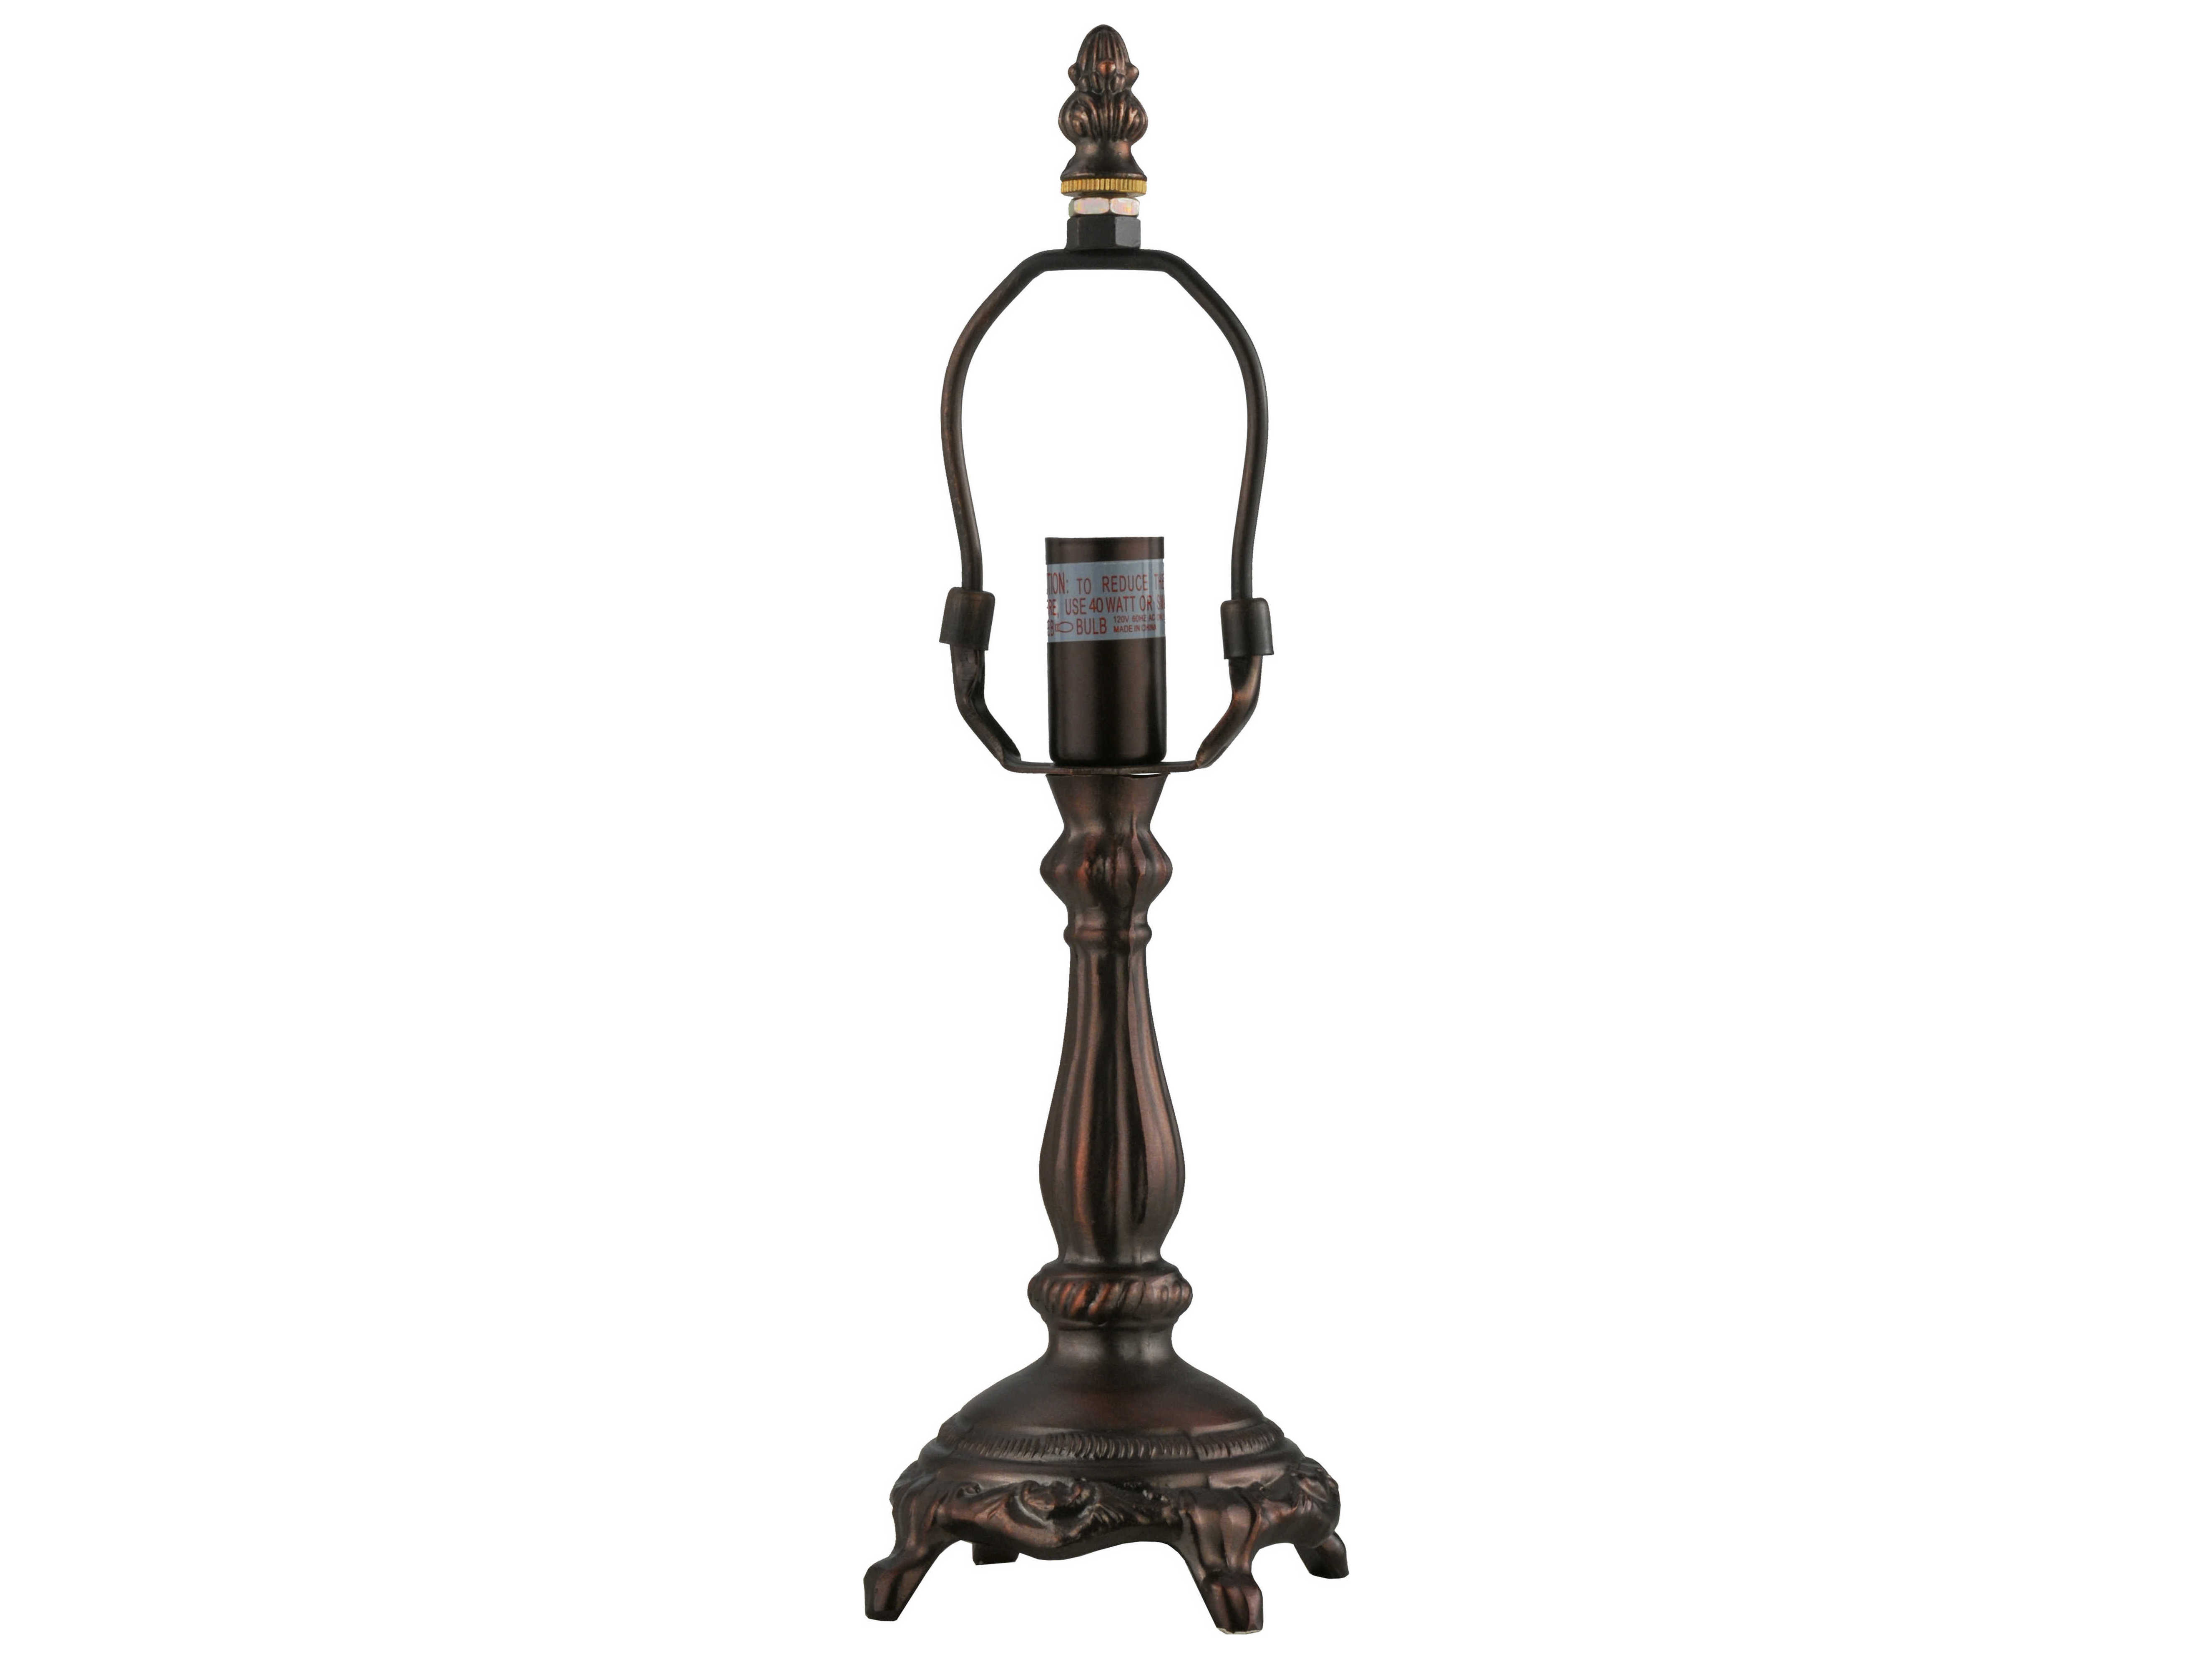 Meyda Tiffany Footed Harp Set Up Table Lamp Base My22716